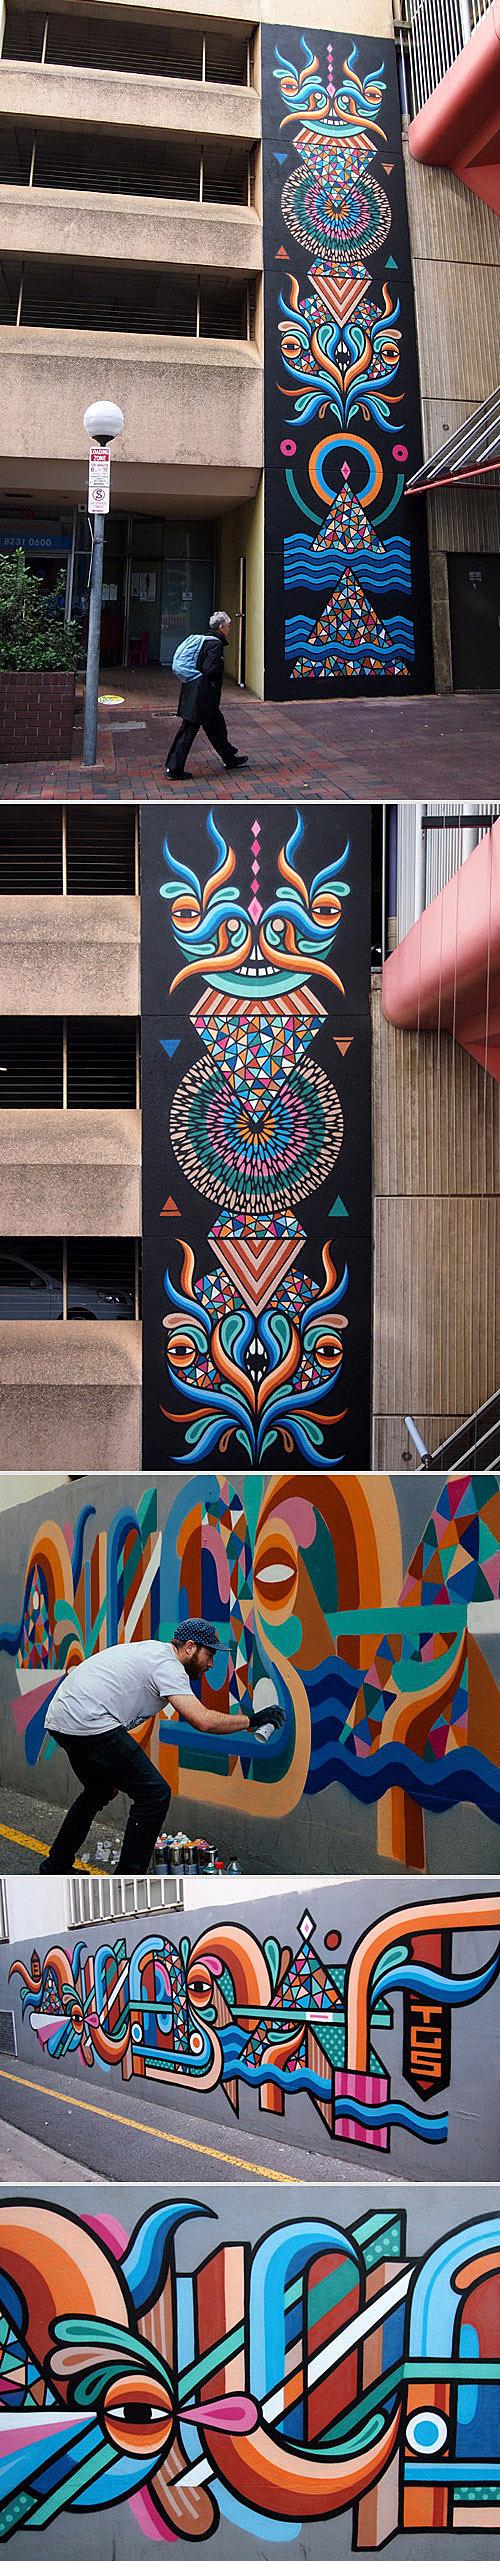 Oi You! #graffiti #colours #street #wall #art #painting #beastman